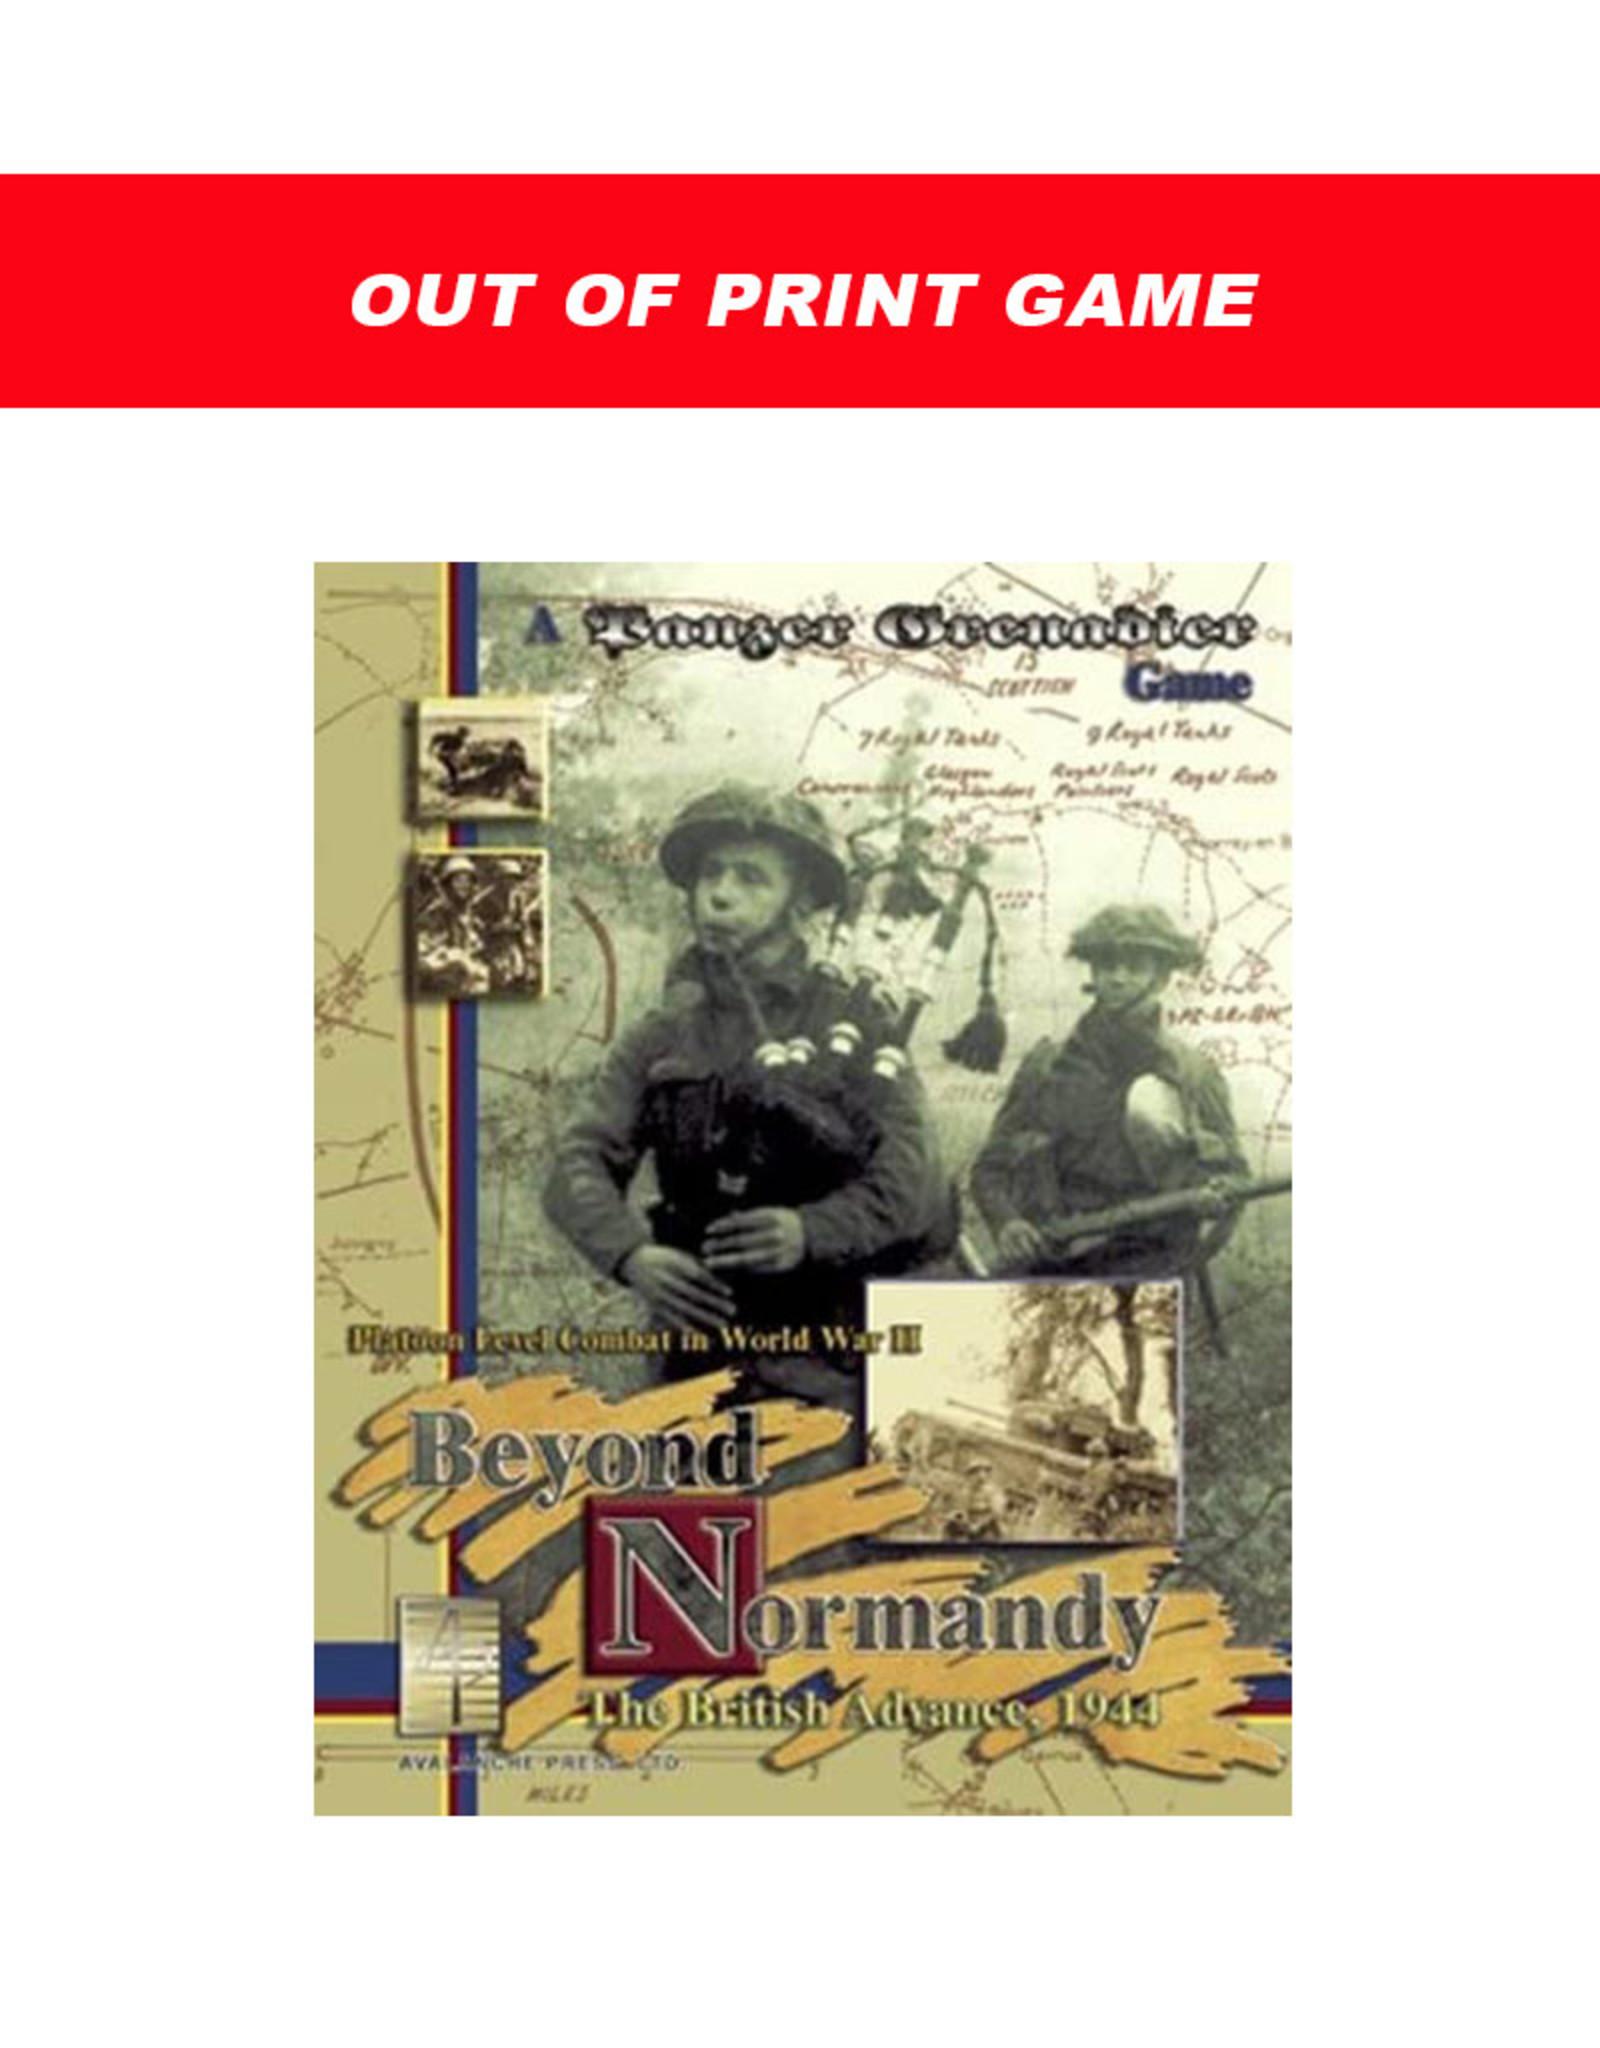 Avalanche Press Beyond Normandy: The British Advance, 1944 (Panzer Grenadier) (OOP)